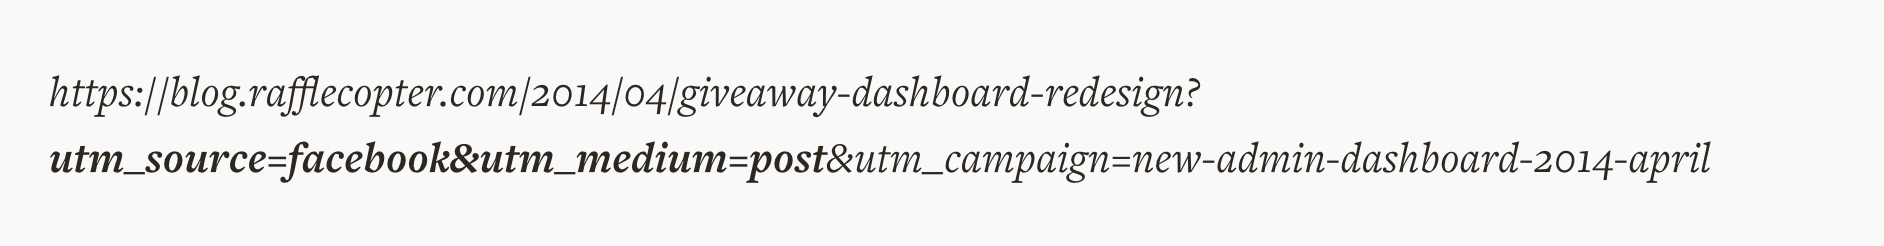 UTM parameters example